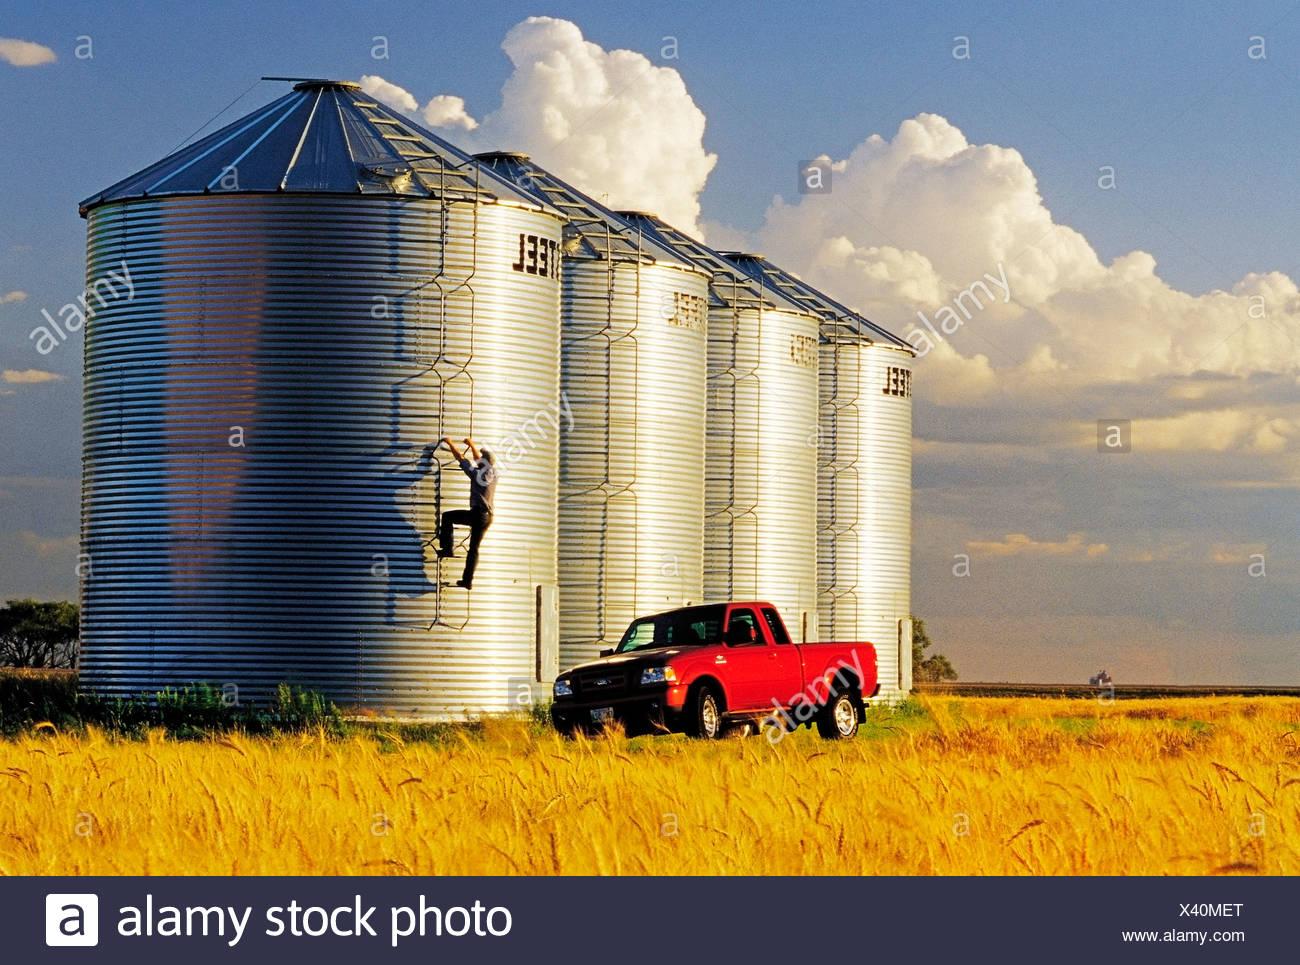 A farmer checks his grain storage bins located in front of a mature